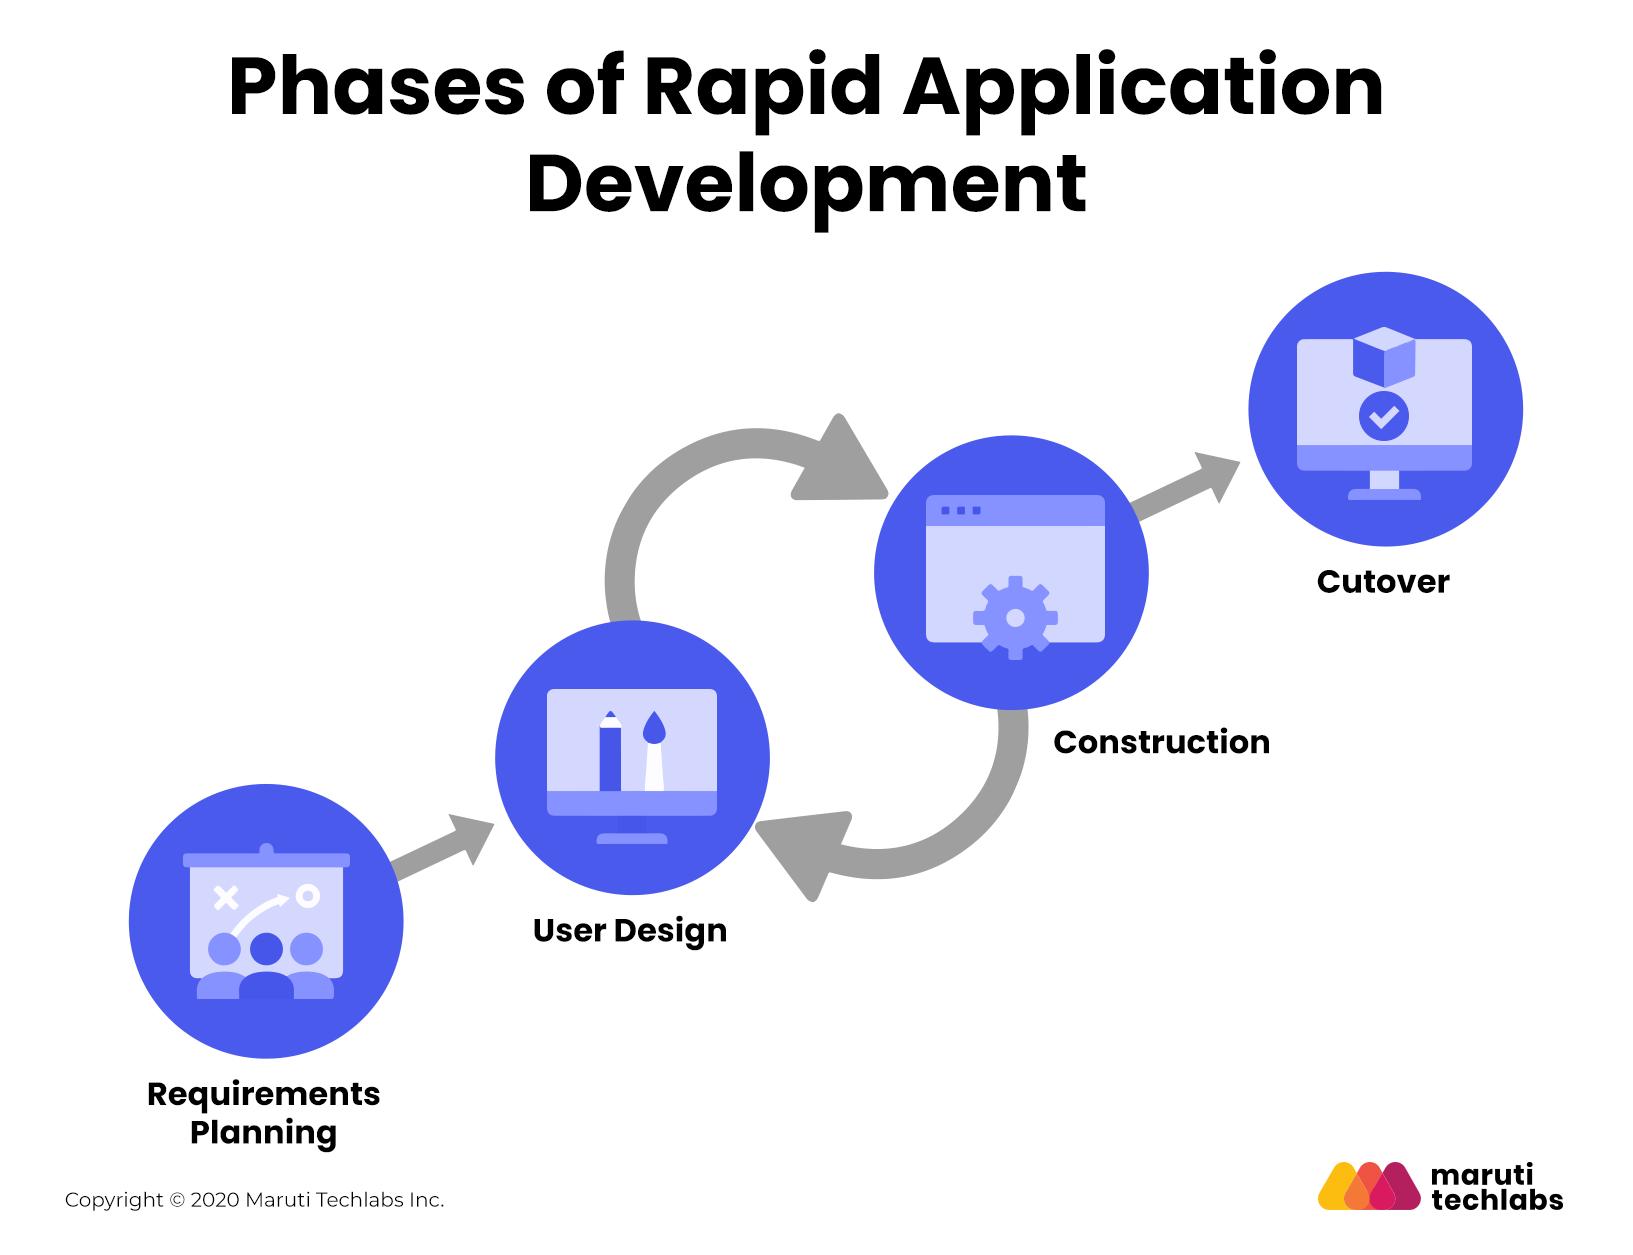 4 phases of rapid application development model